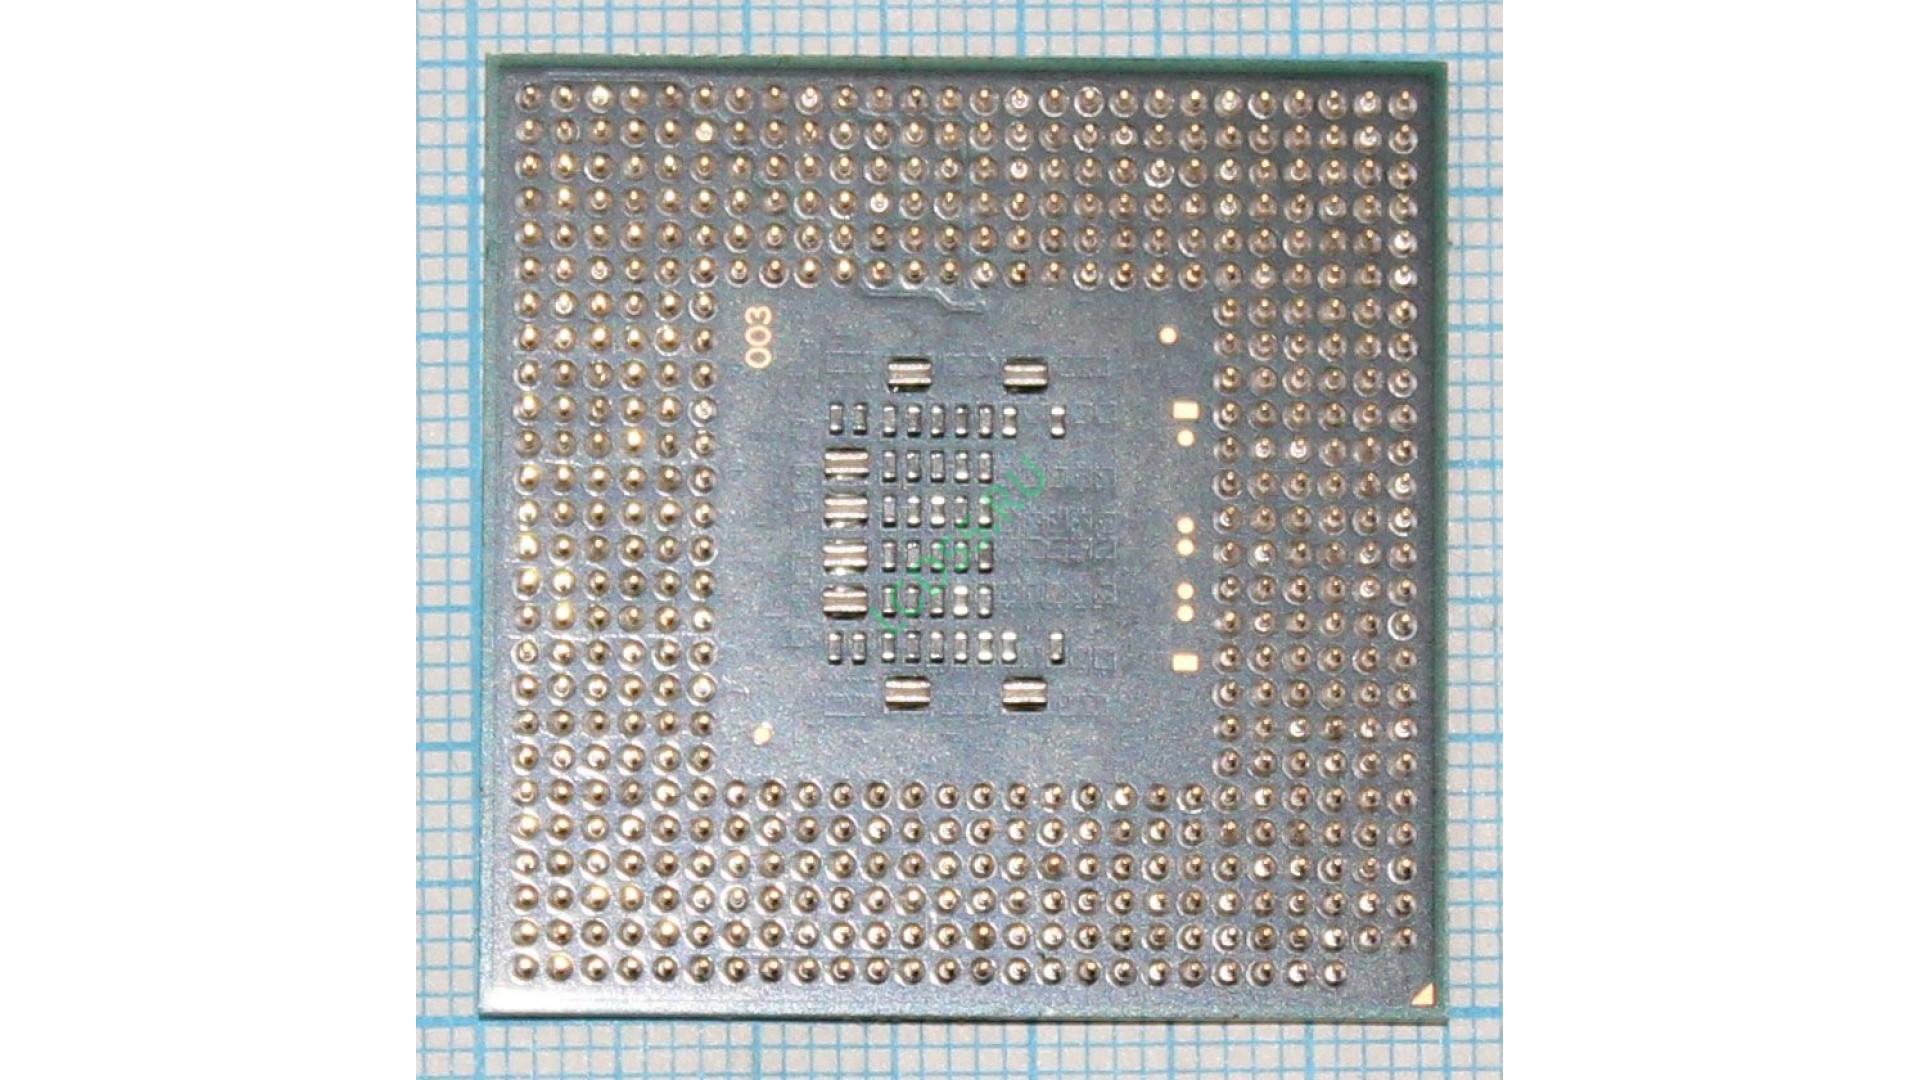 Intel T2310 SLAEC